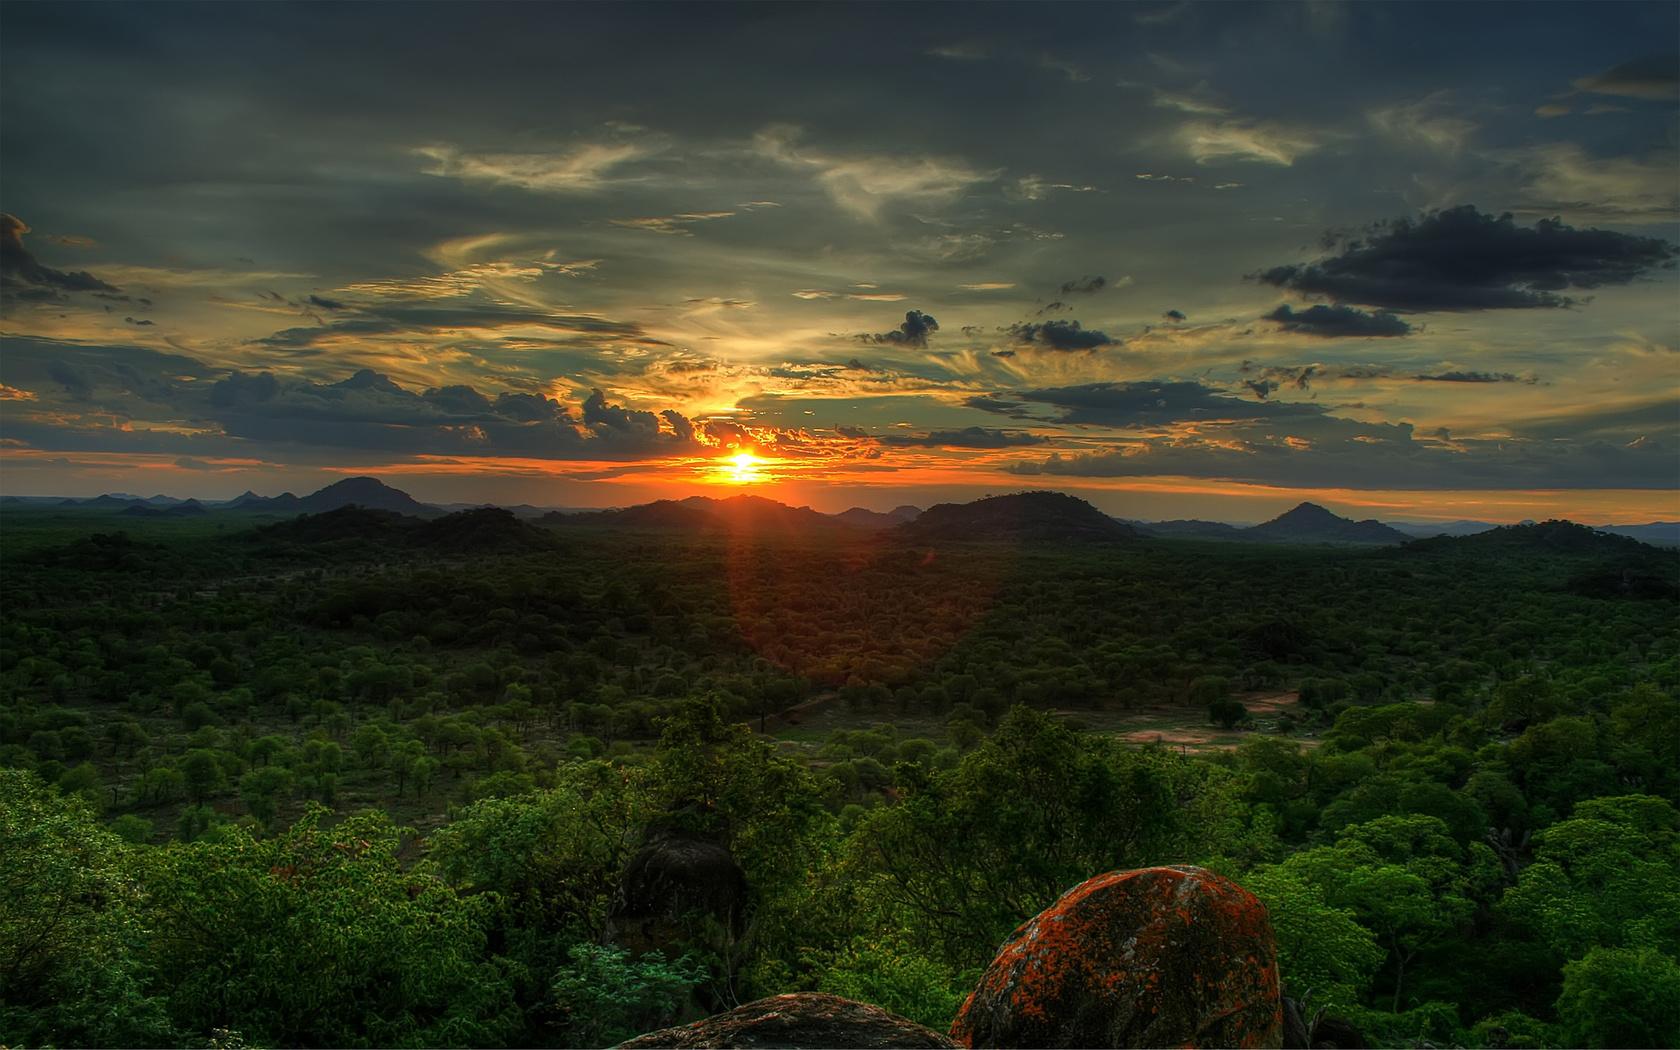 african sunset, sky, sunset, the sun, trees, небо,облака, природа